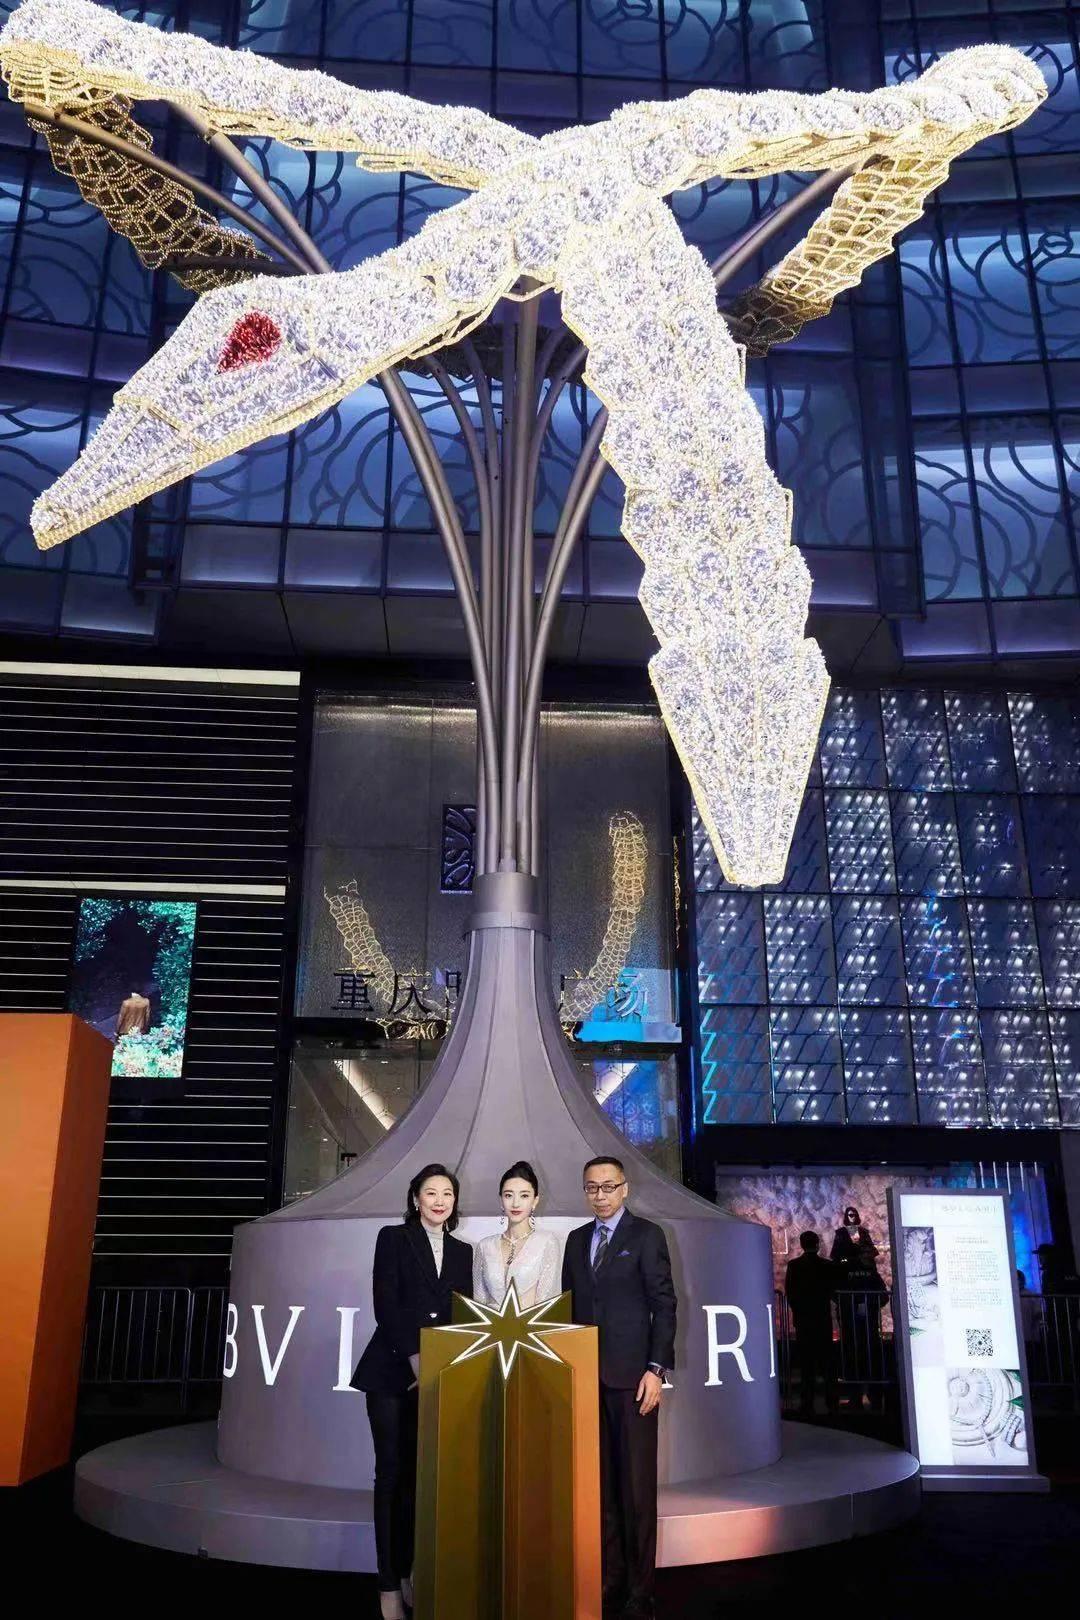 Serpenti蛇形灯光艺术装置闪耀重庆时代广场